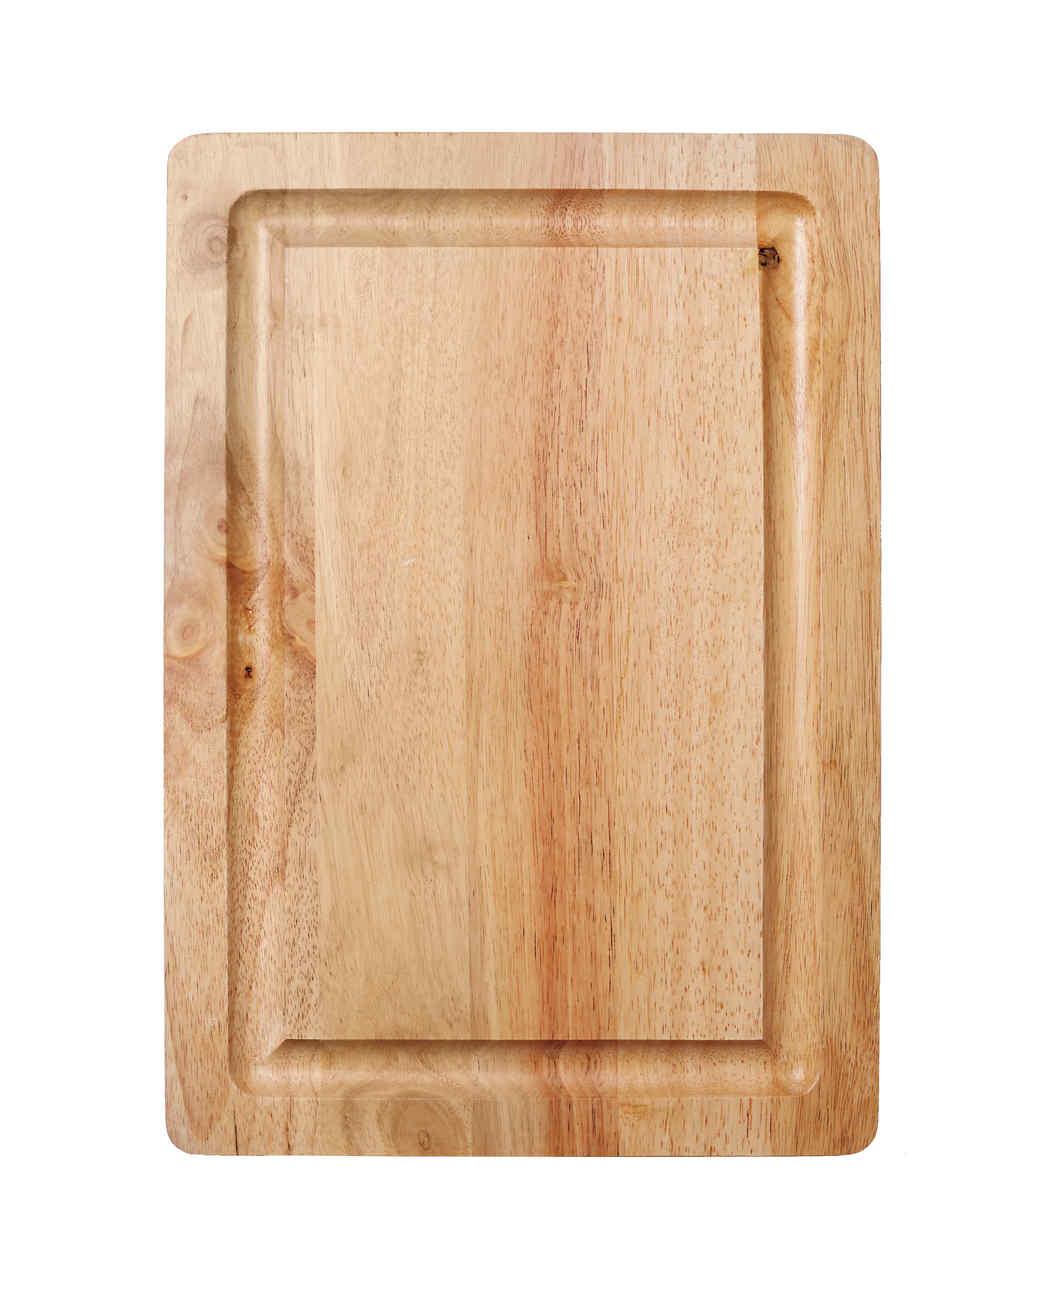 cutting-board-mld110973-029.jpg